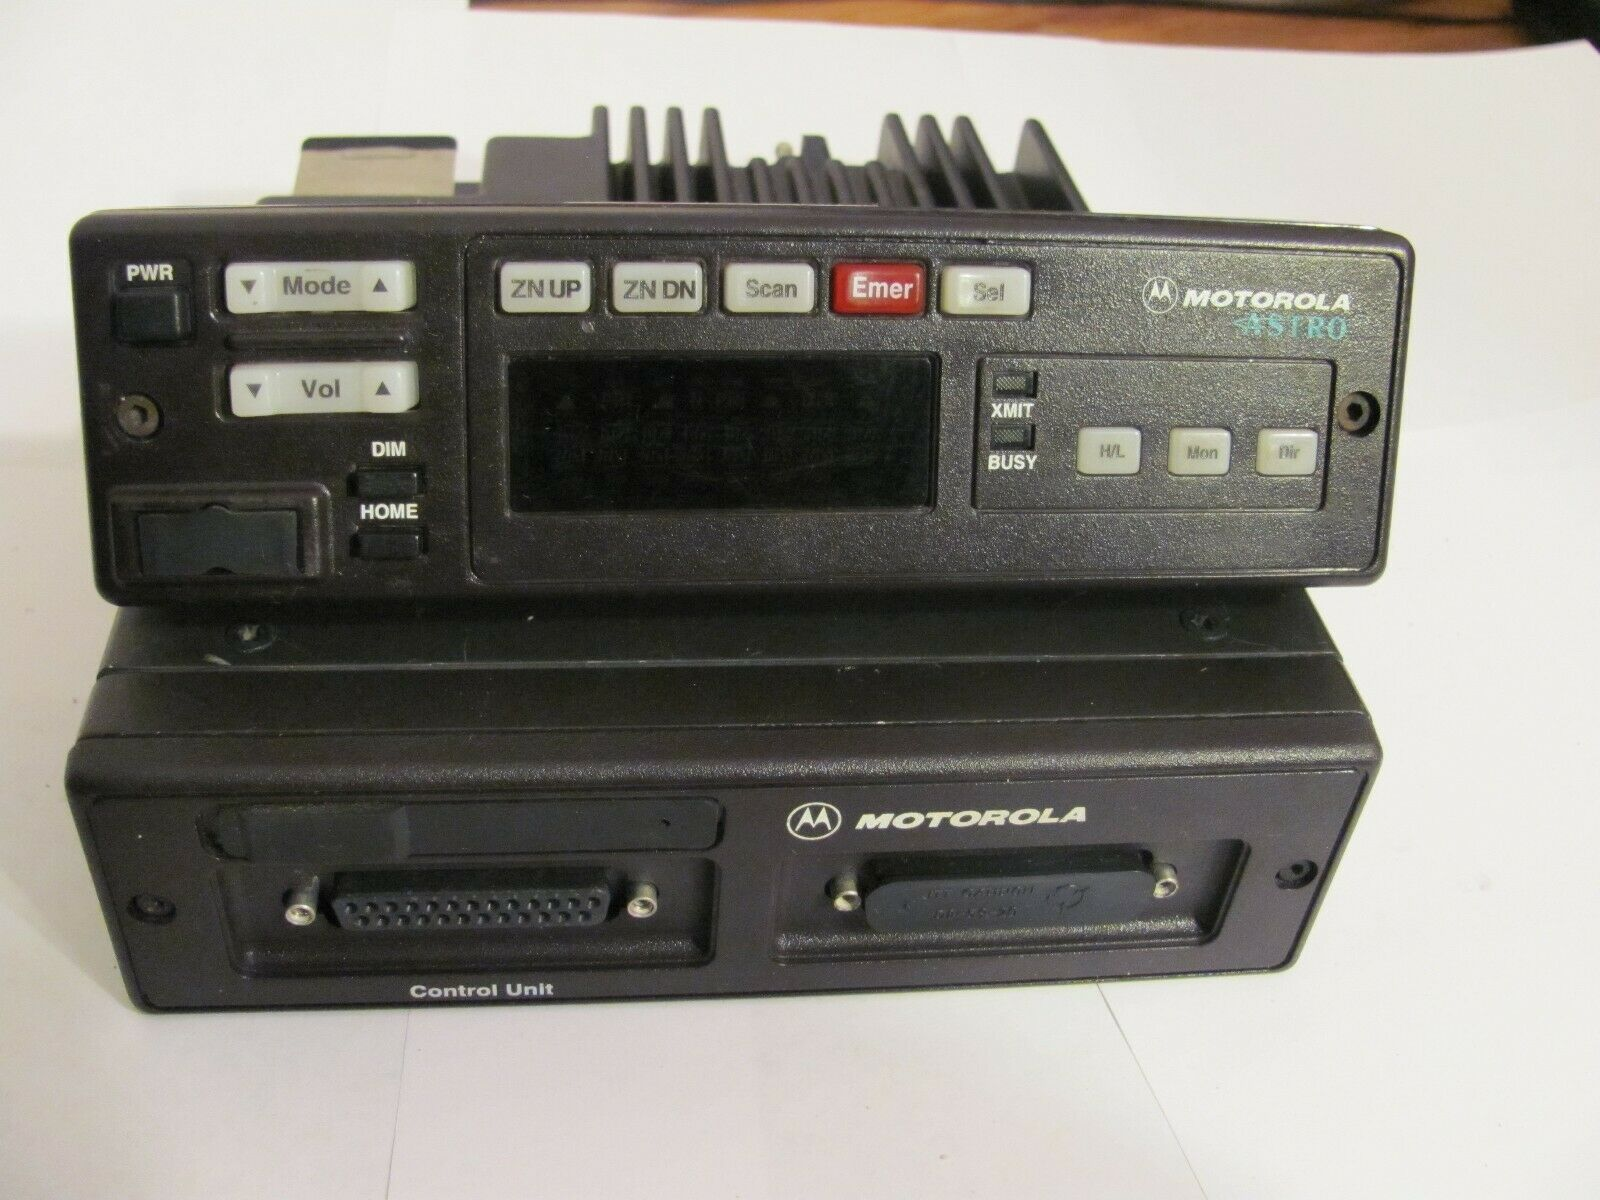 Motorola Astro Spectra VHF 146 - 174 MHz T99DX+089W_ASTRO D04KKF9PW5AN. Buy it now for 150.00